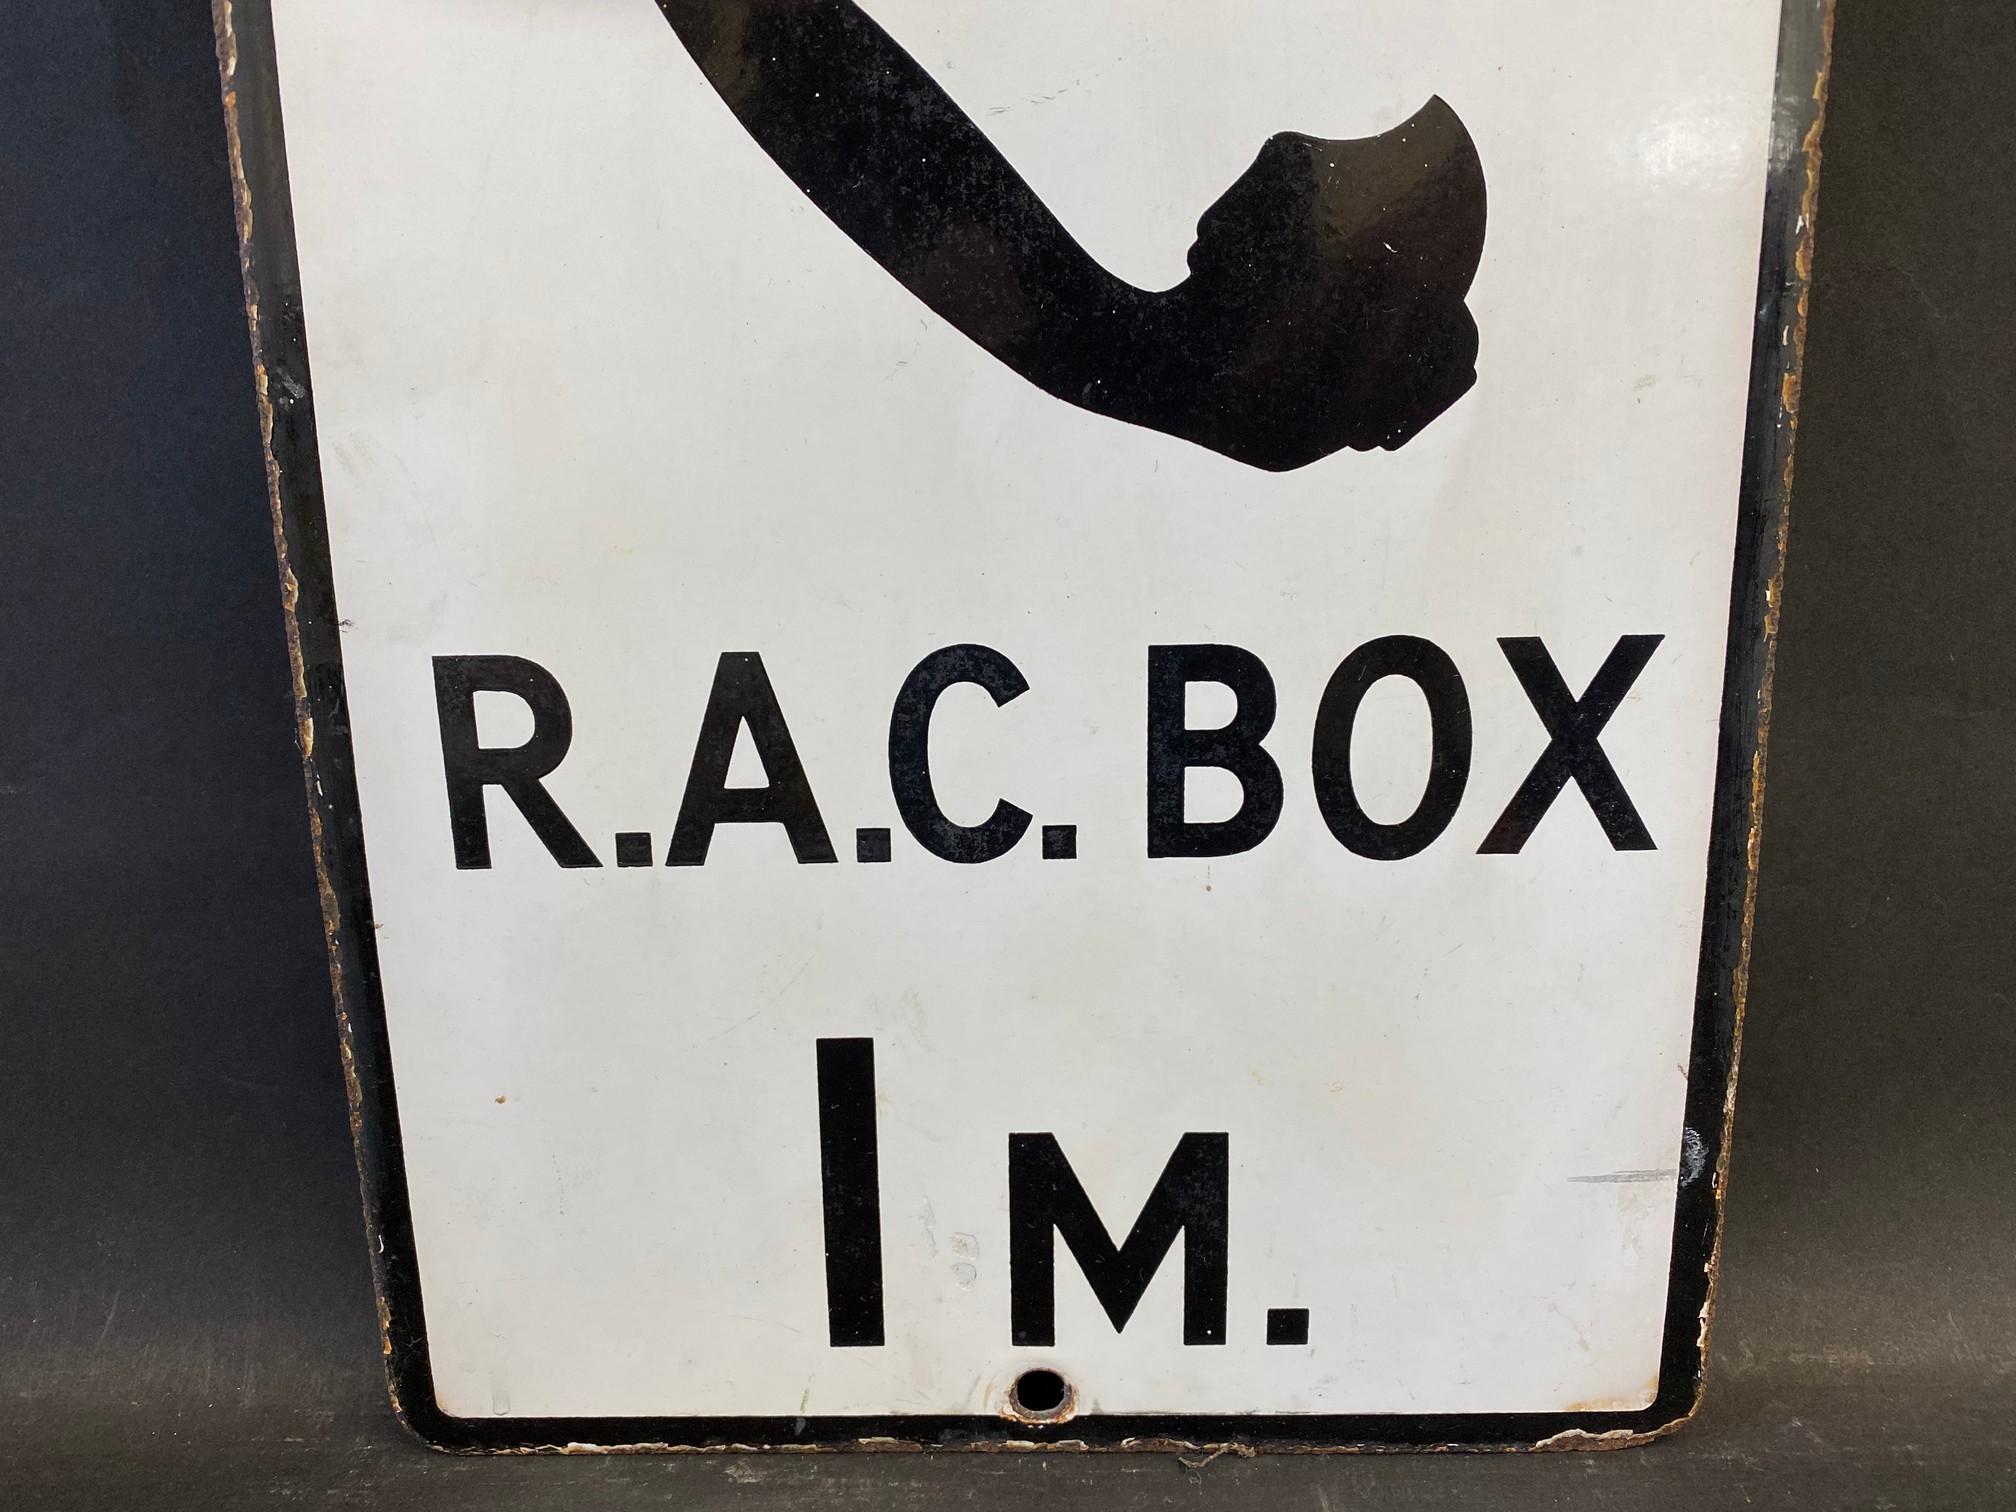 "An RAC Box 1 mile rectangular enamel sign, 10 x 20"". - Image 3 of 4"